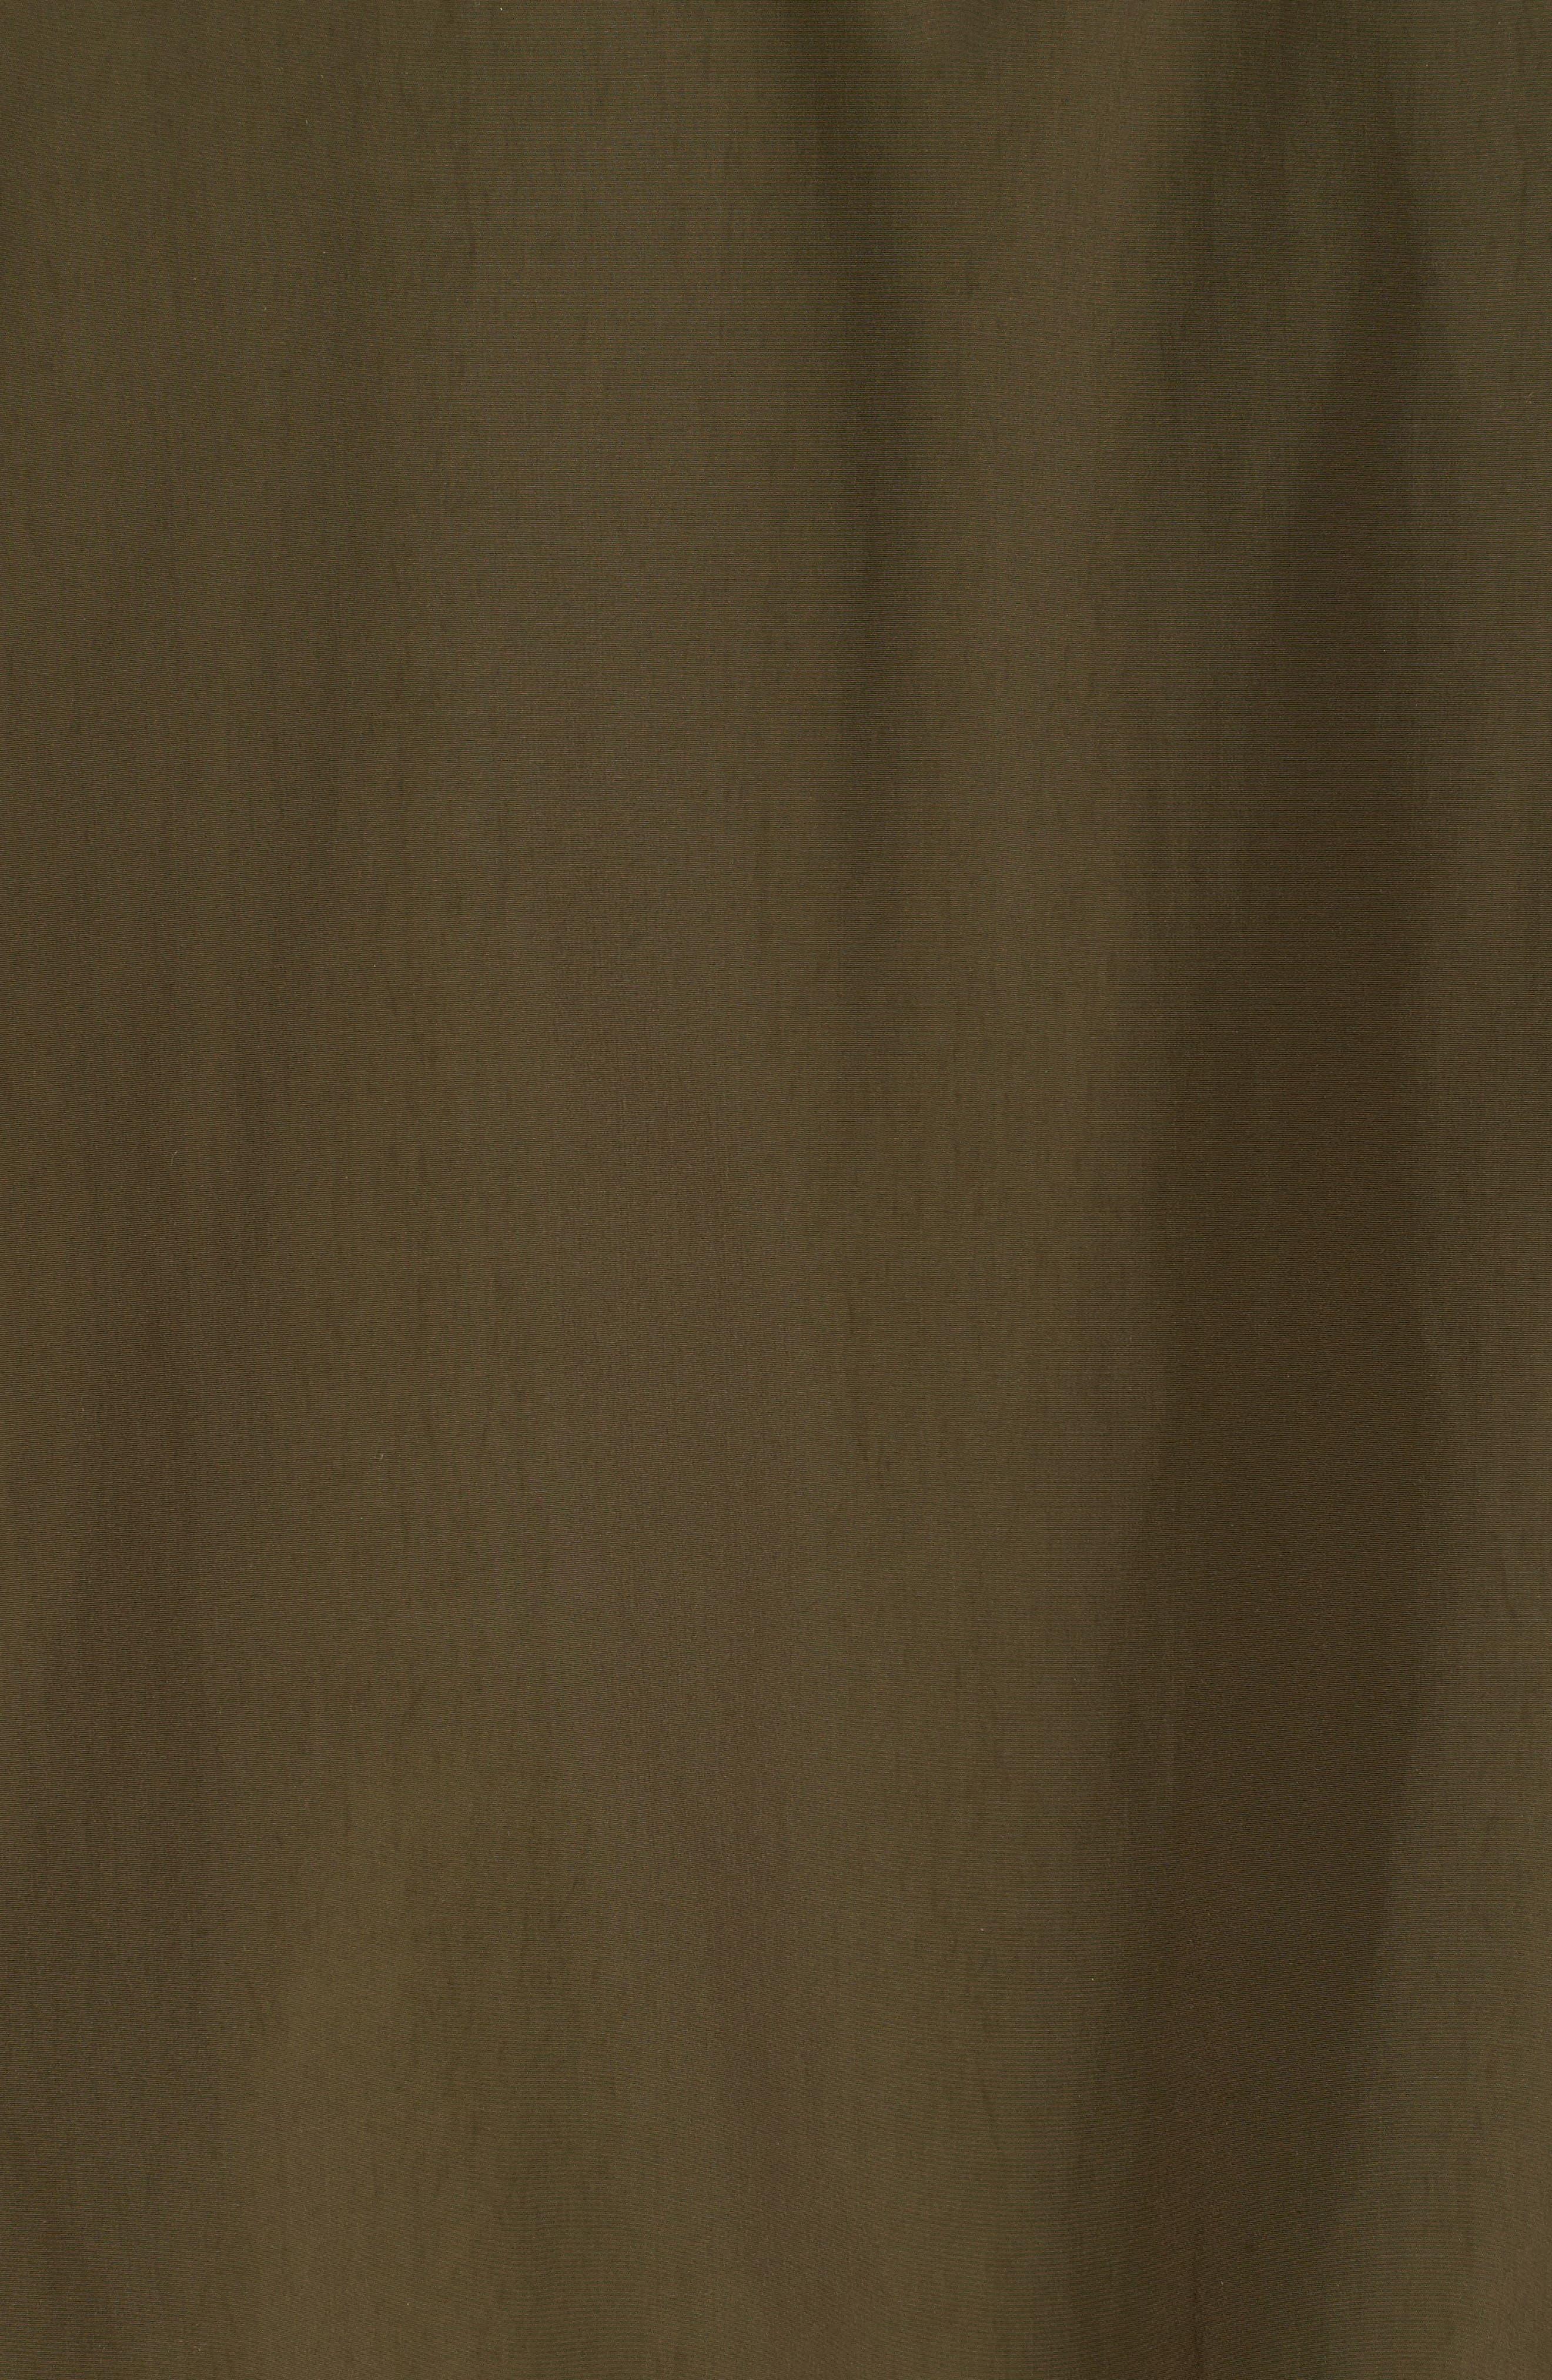 Shore Bomber Jacket,                             Alternate thumbnail 5, color,                             Tenkara Green